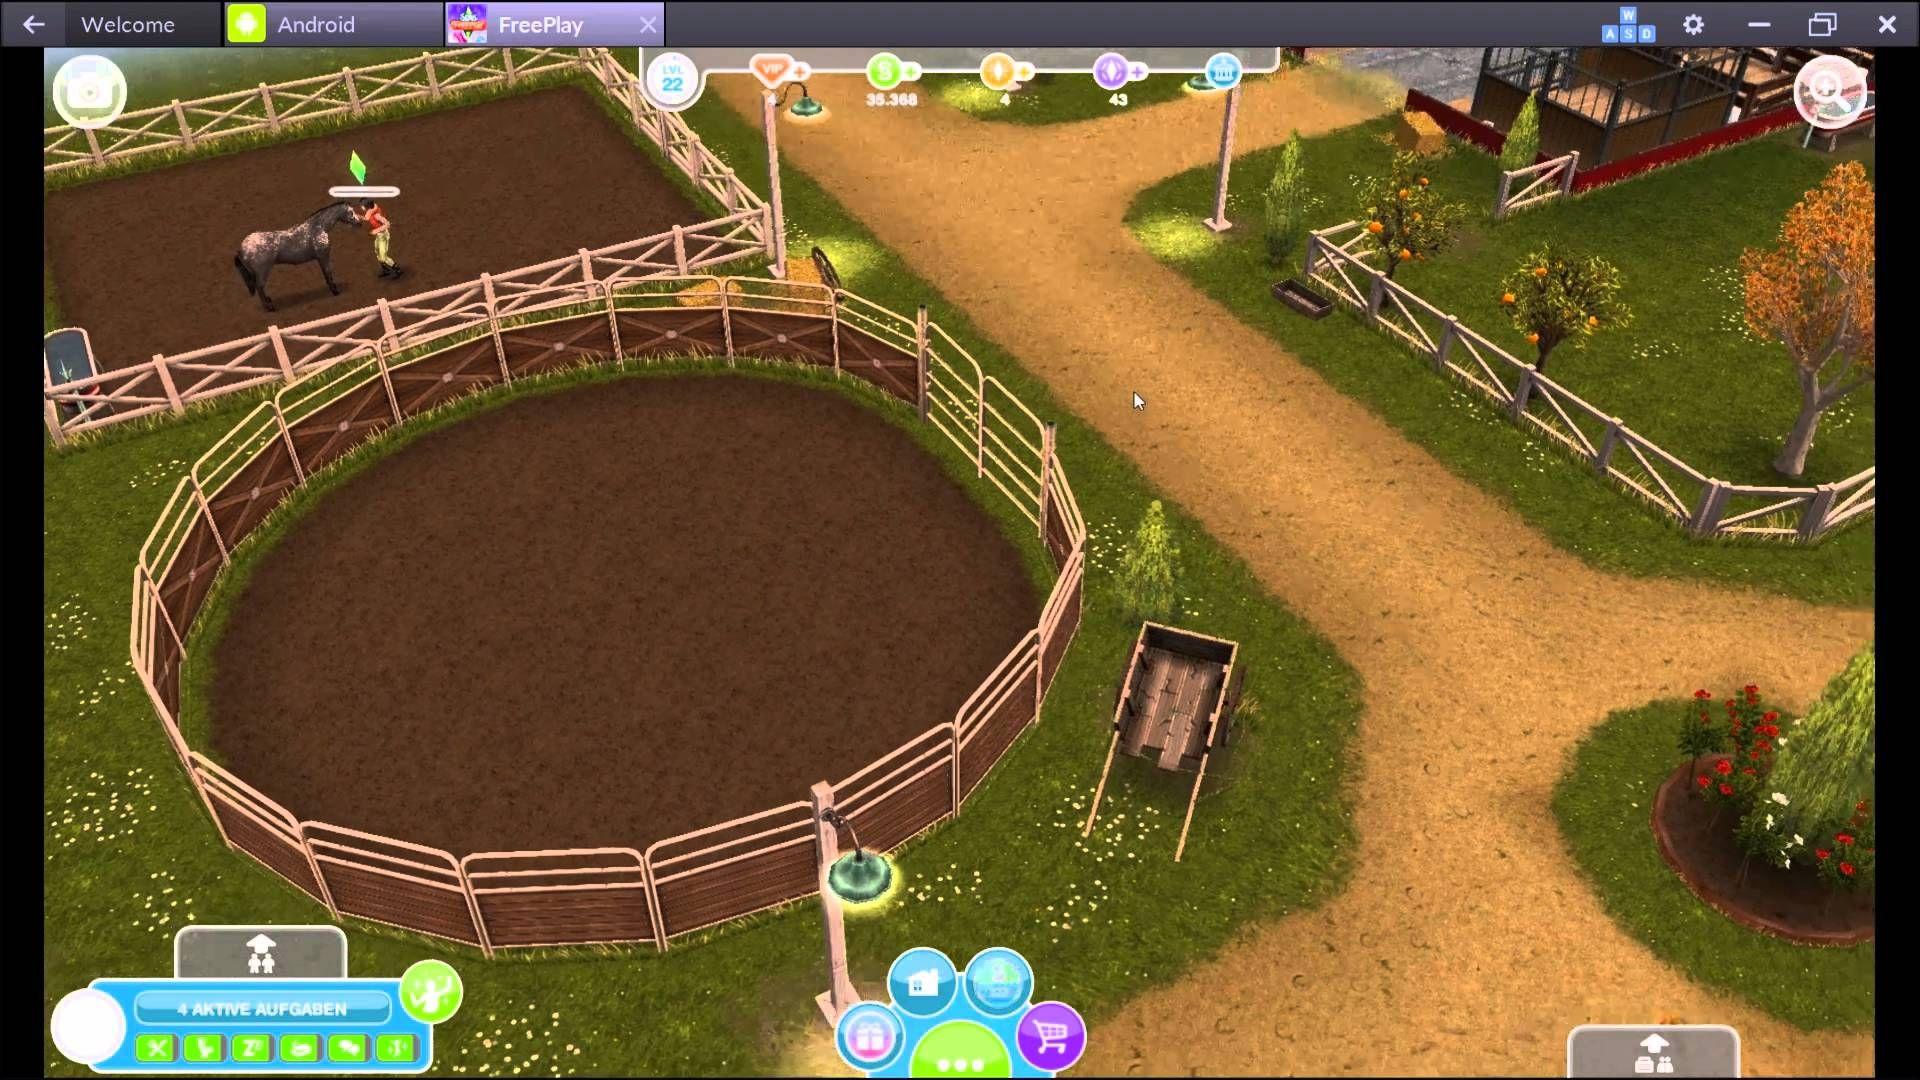 Superknirps Geheimmission Lets Play Sims Freeplay 66 Games